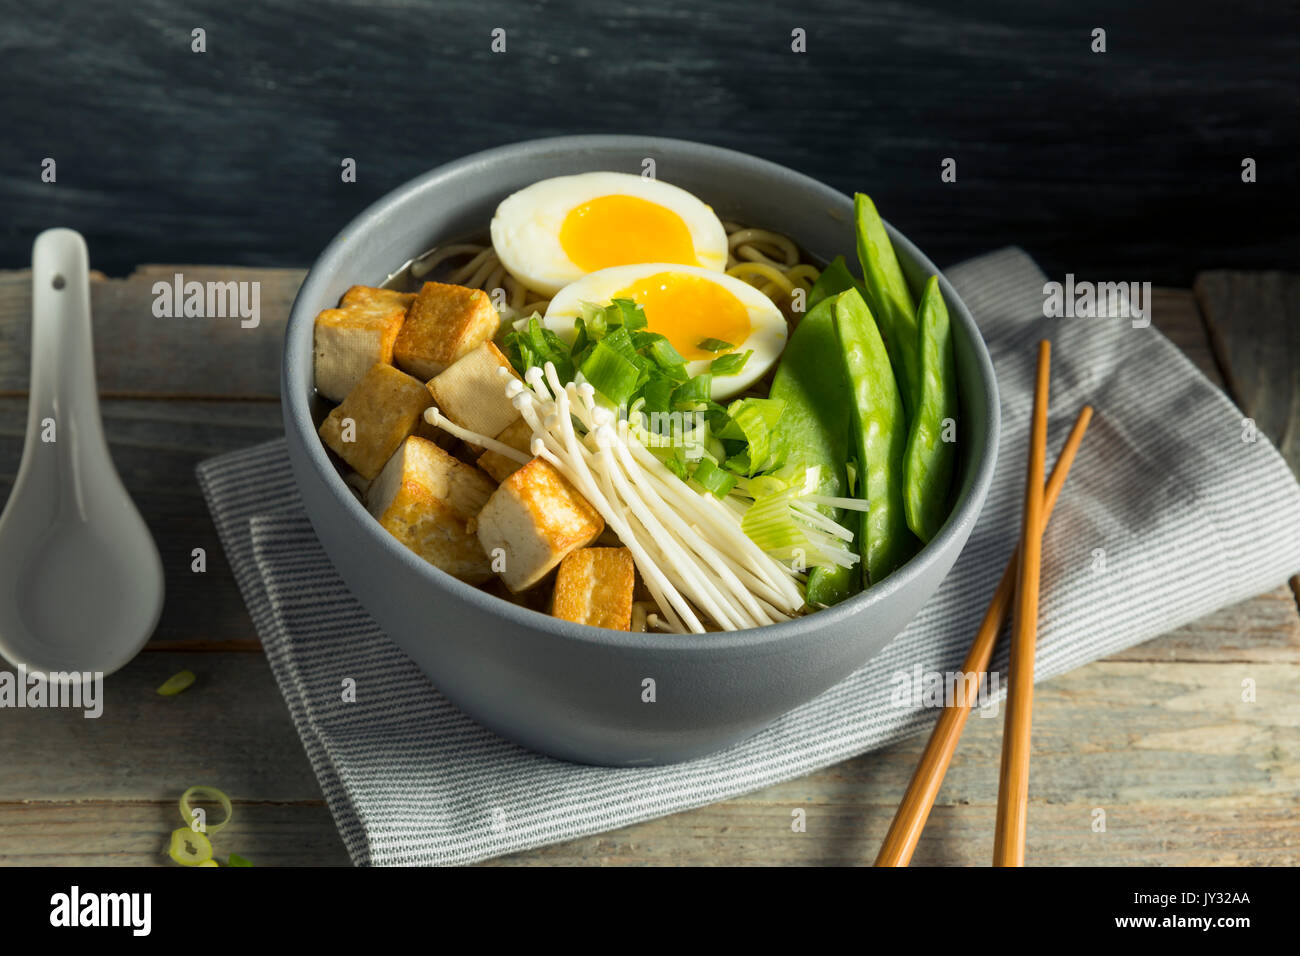 Homemade Japanese Vegan Tofu Ramen Noodles with Egg and Mushrooms - Stock Image